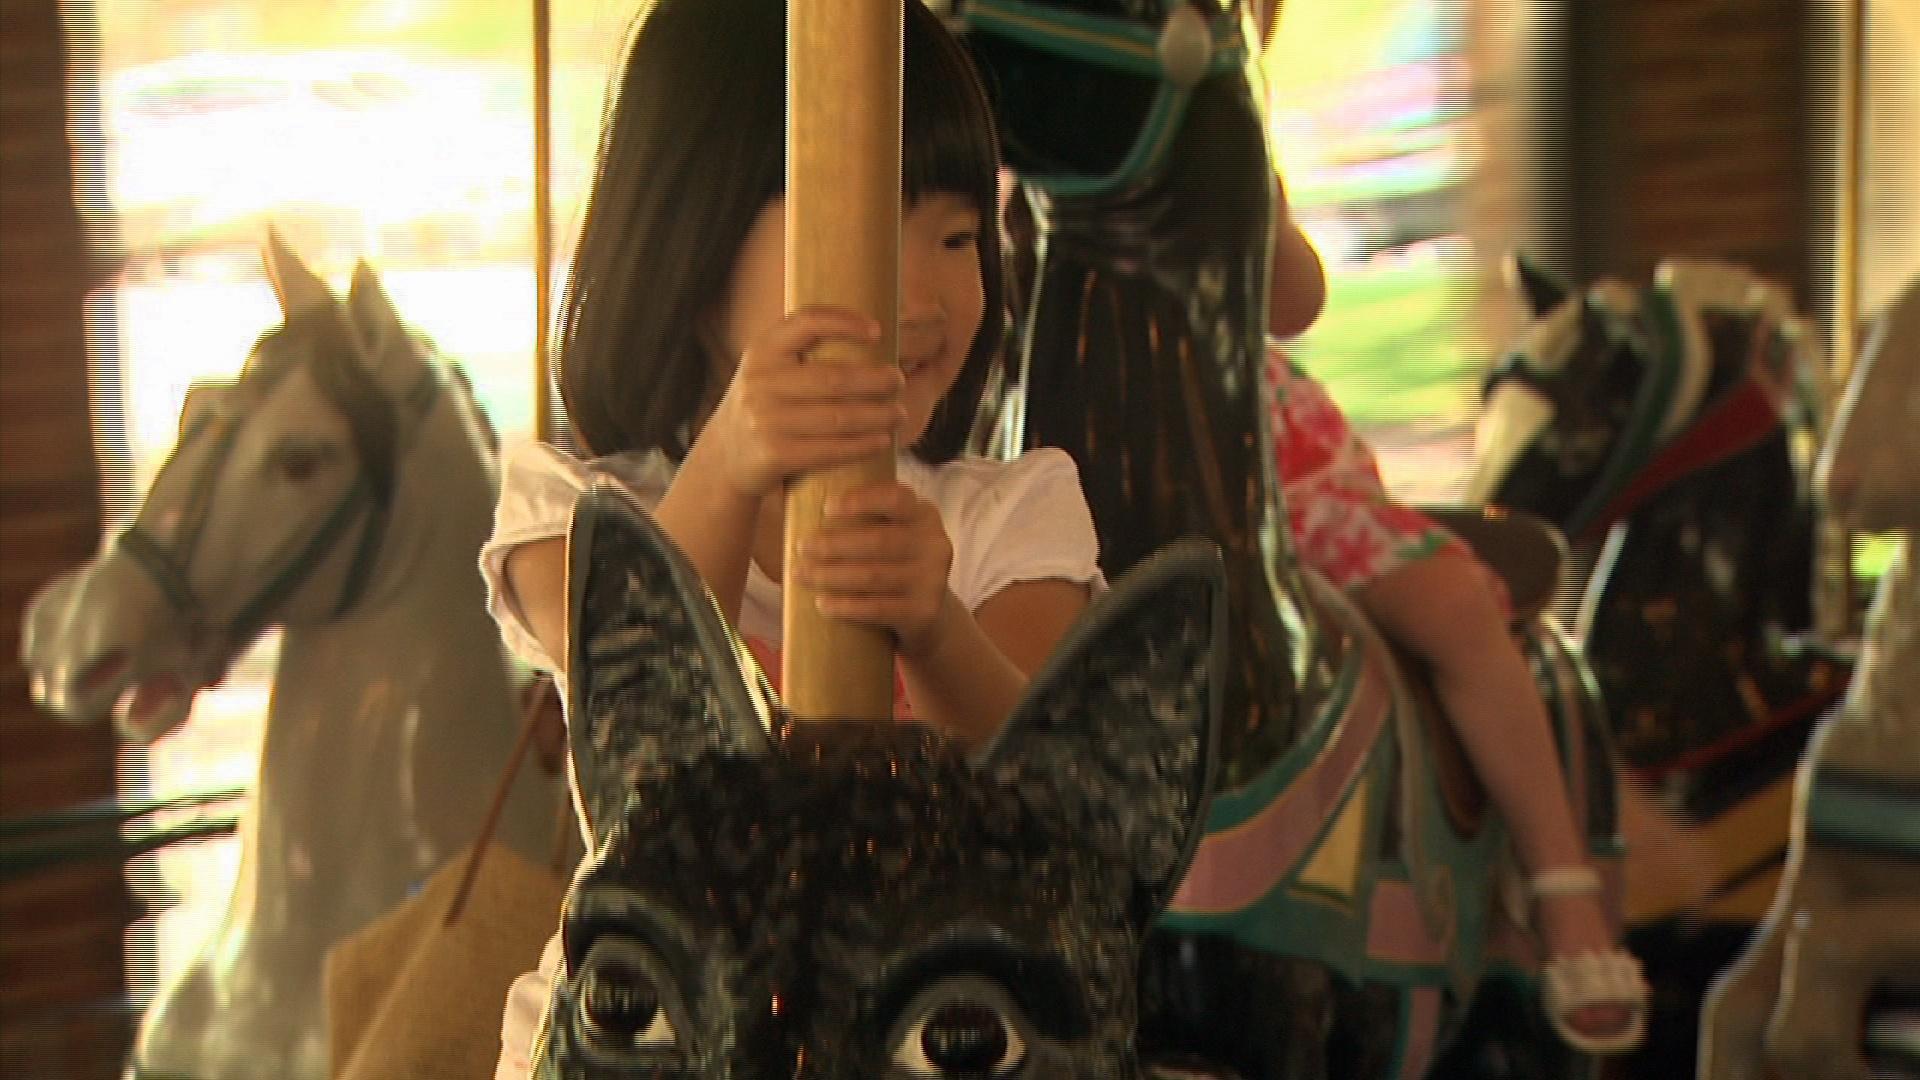 Carousel at Burlington City Park  image